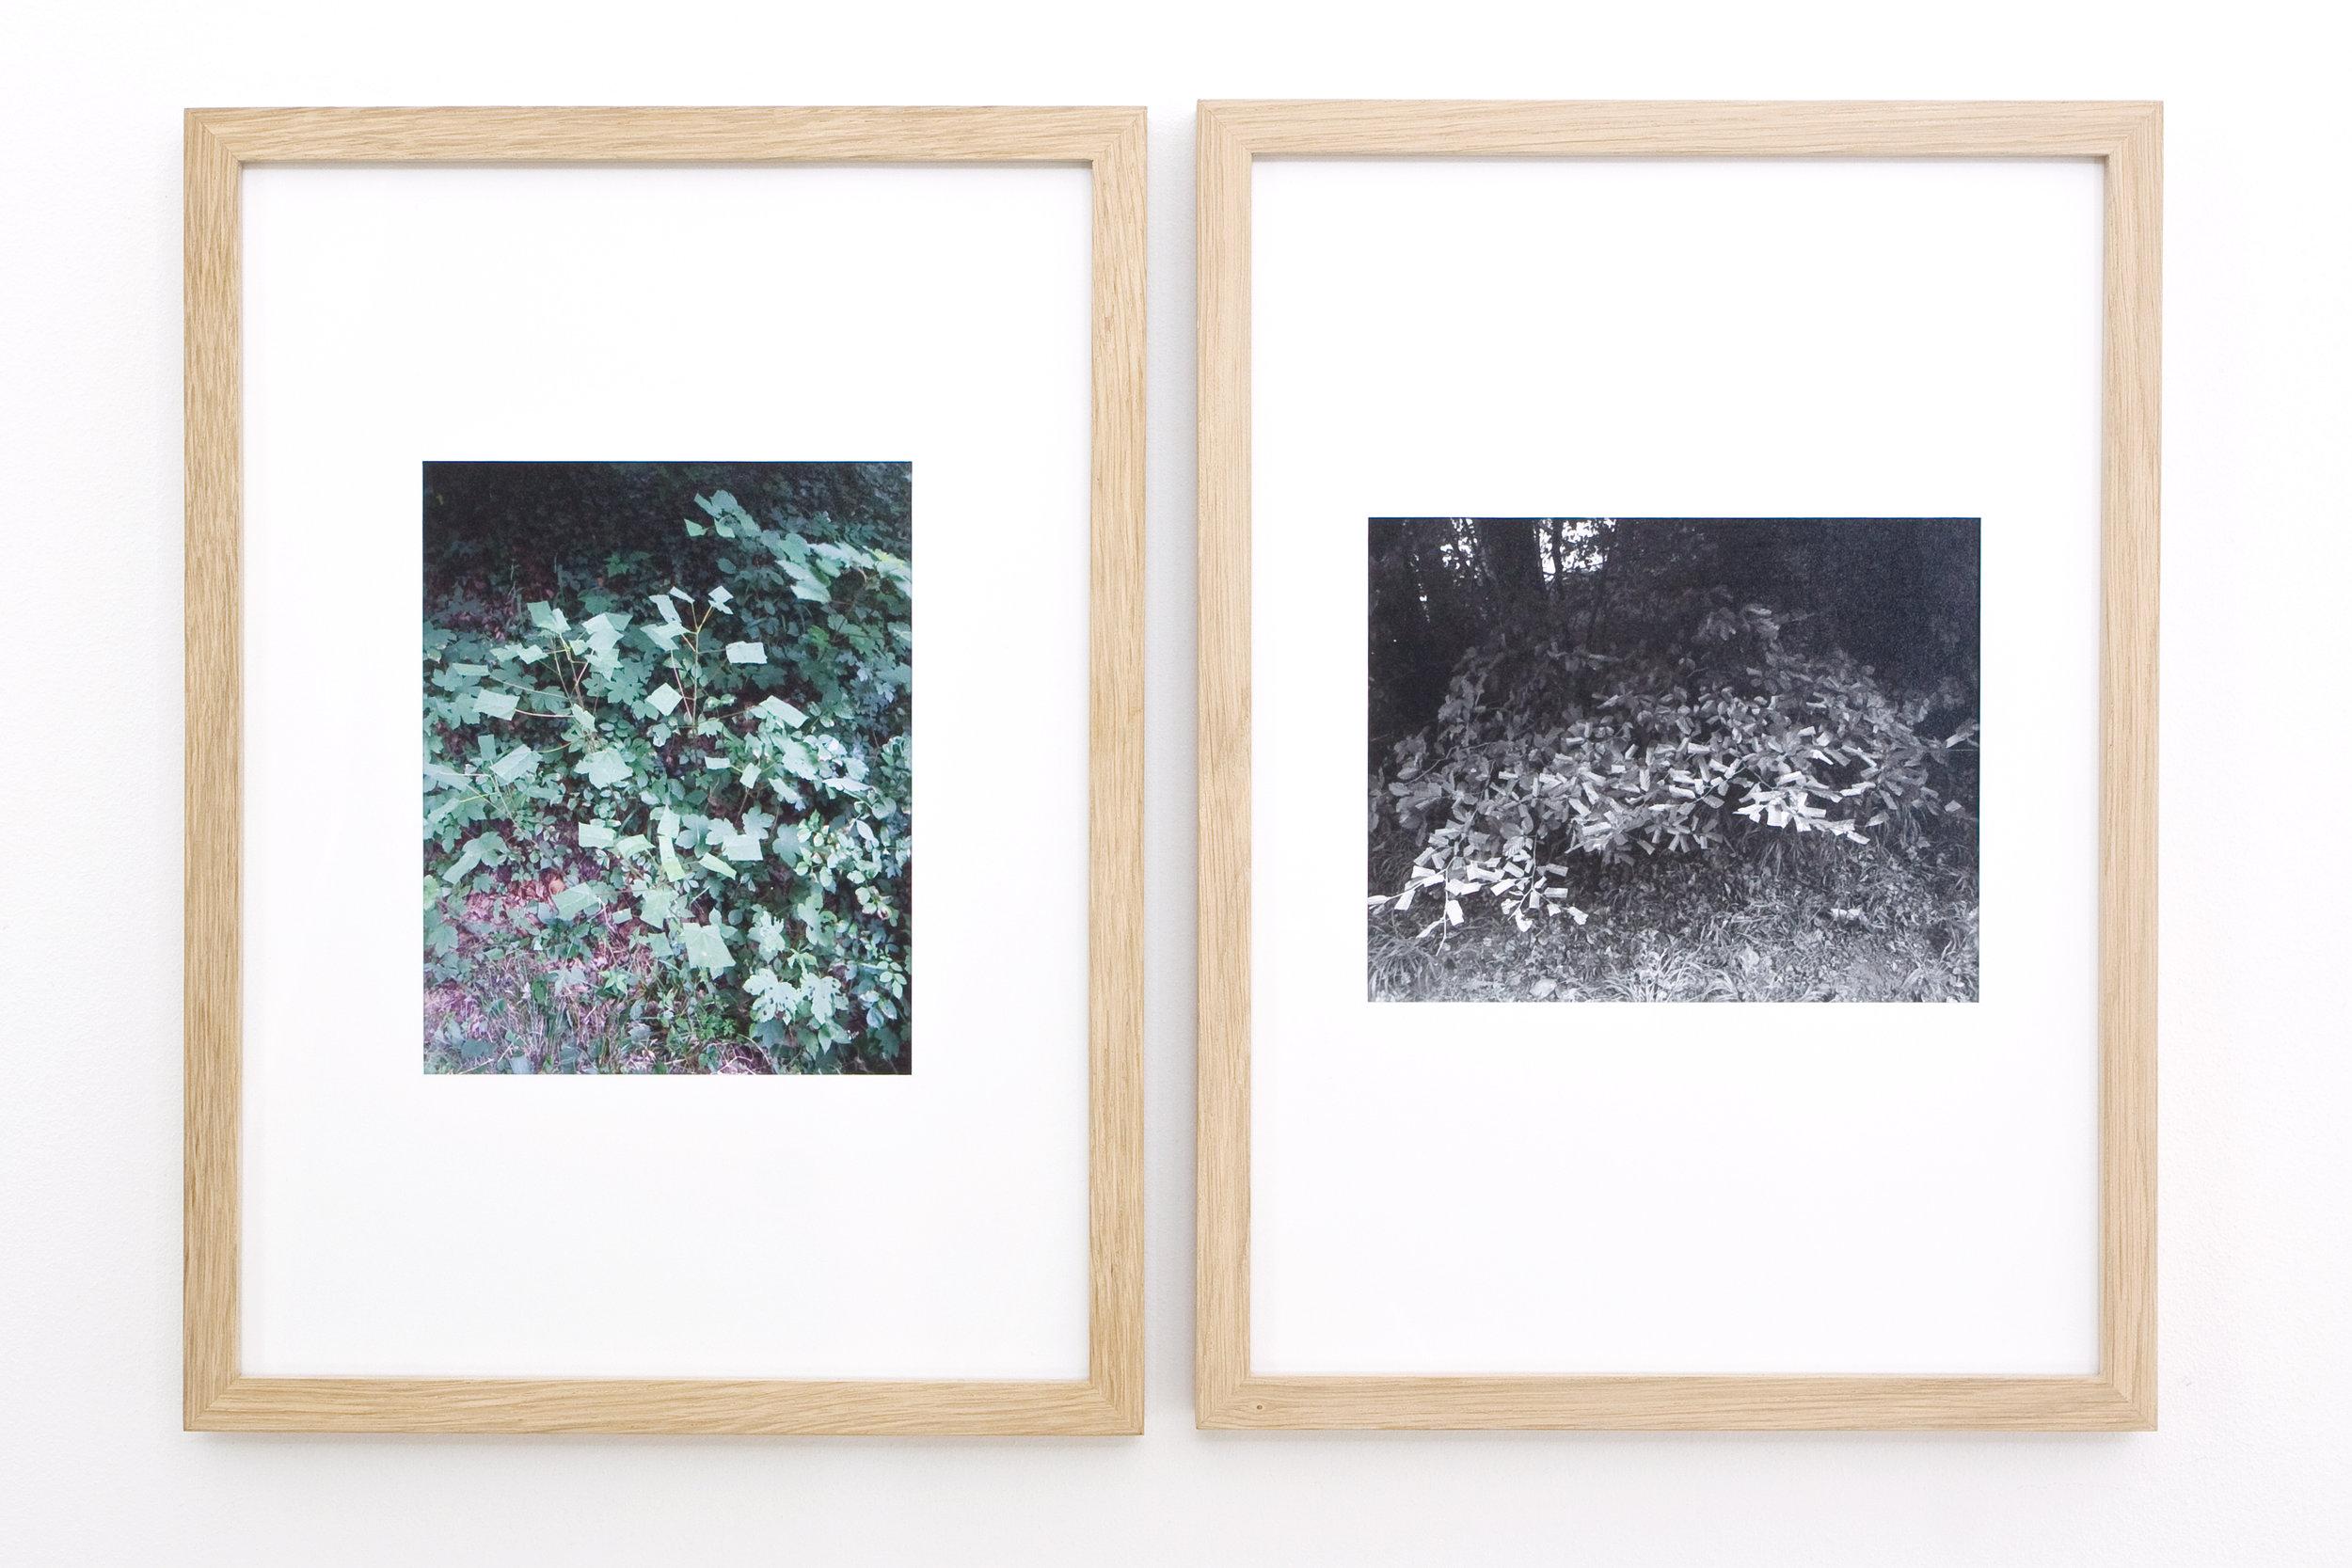 <p>Colliding Beam – Barbara Müller (installation view)</p>